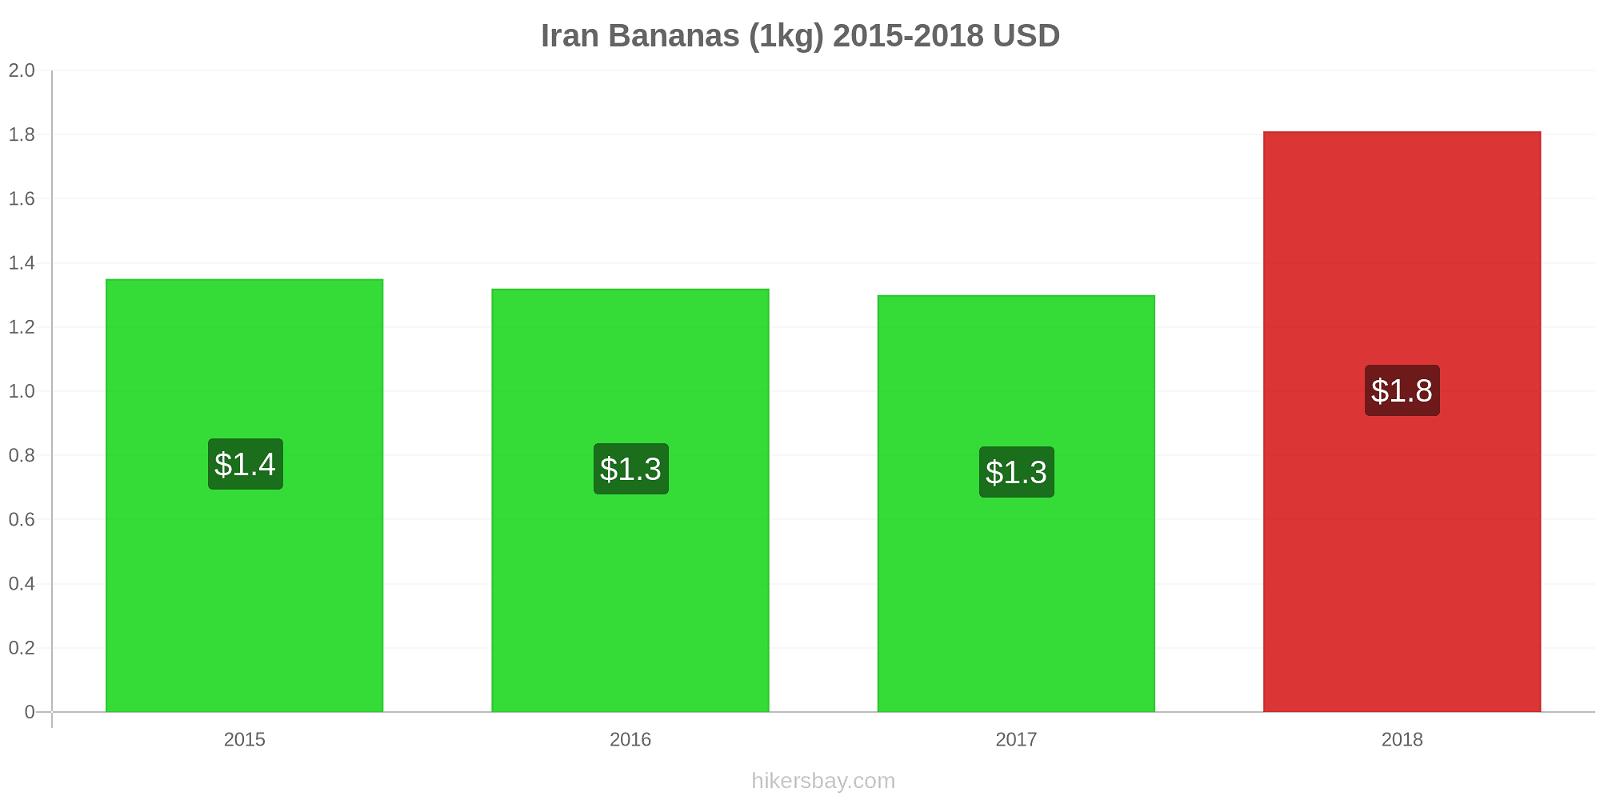 Iran price changes Bananas (1kg) hikersbay.com